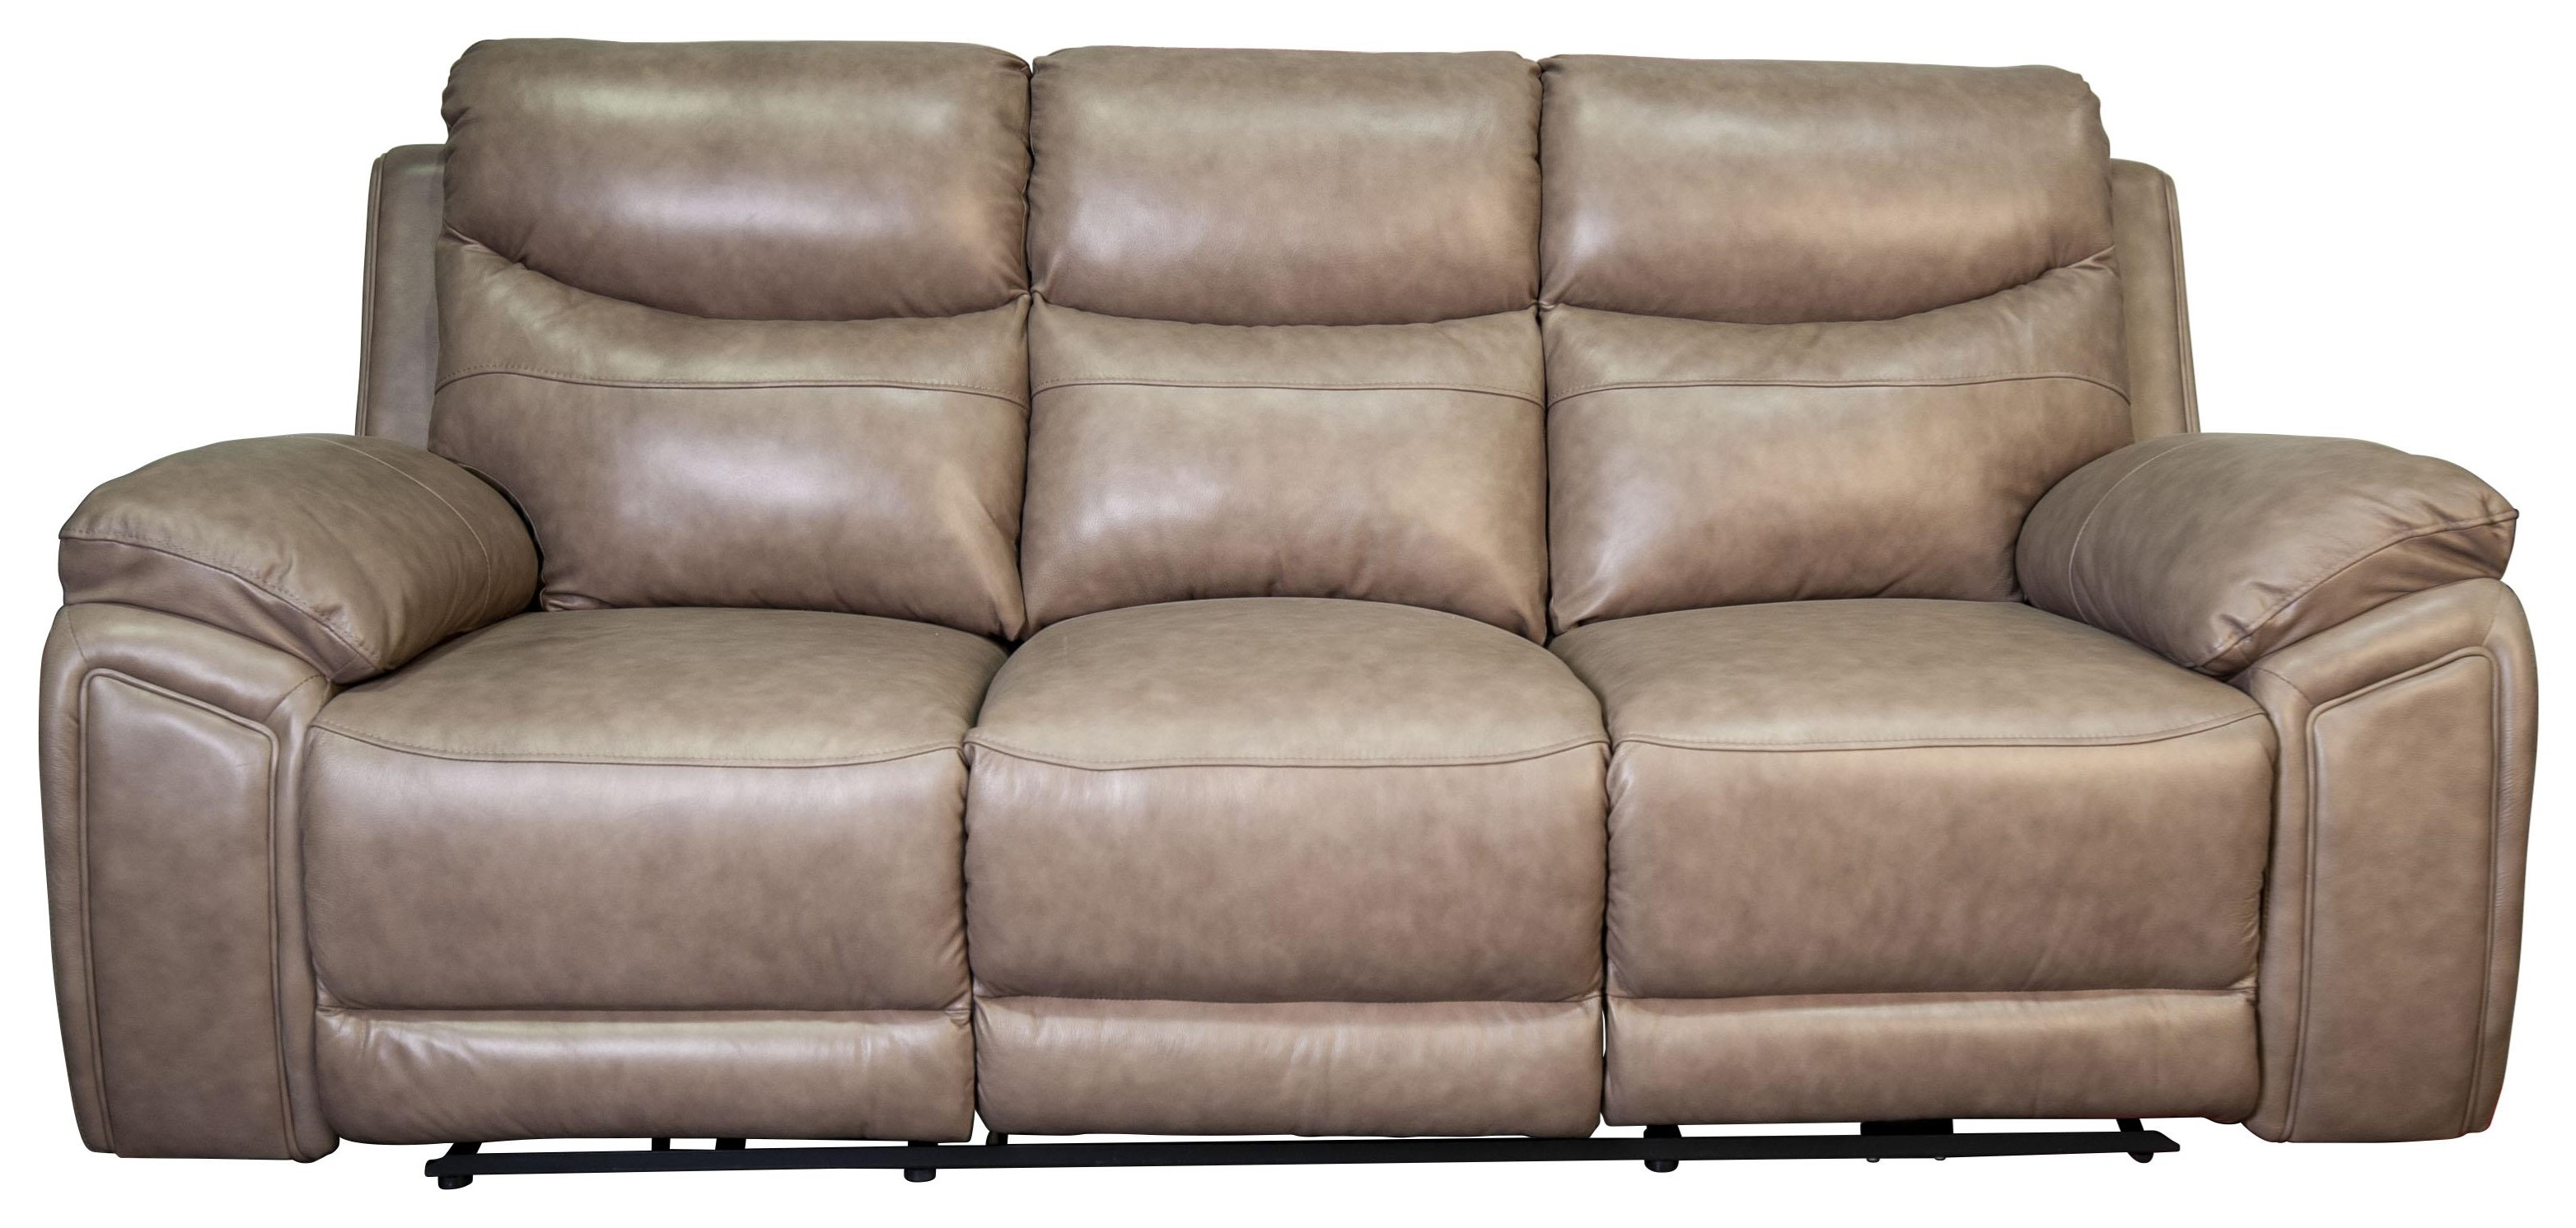 Jarvis Power Reclining Sofa